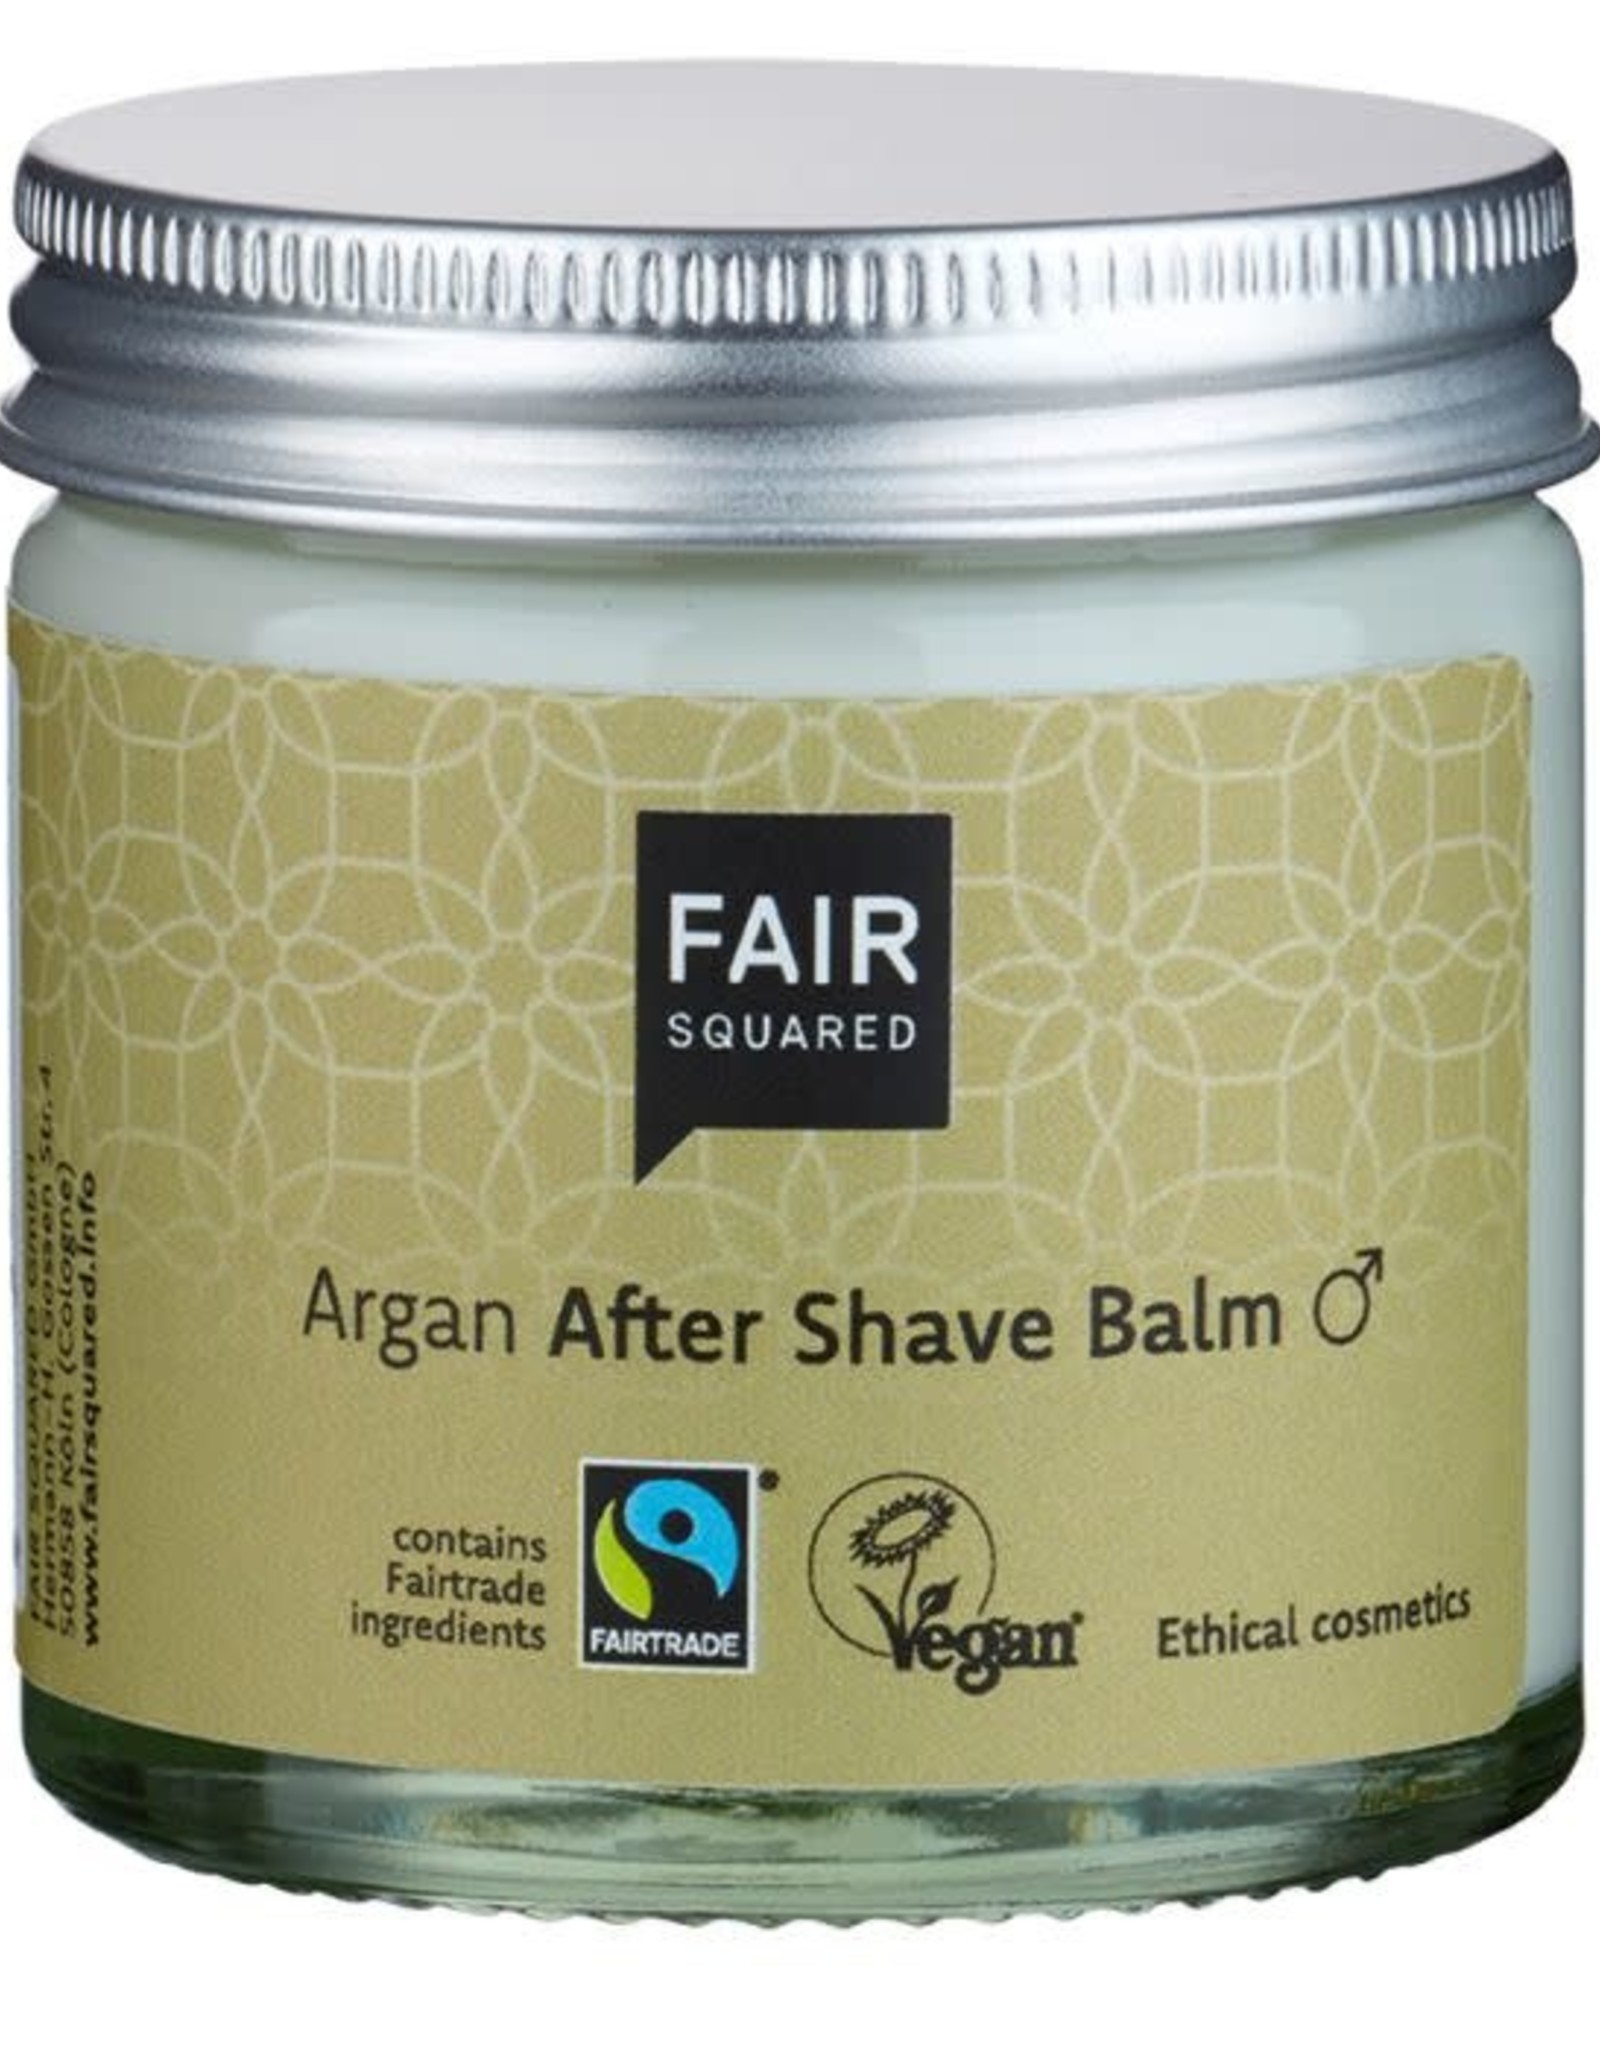 FairSquared FairSquared - After shave balm man Argan 50ml - Zero Waste